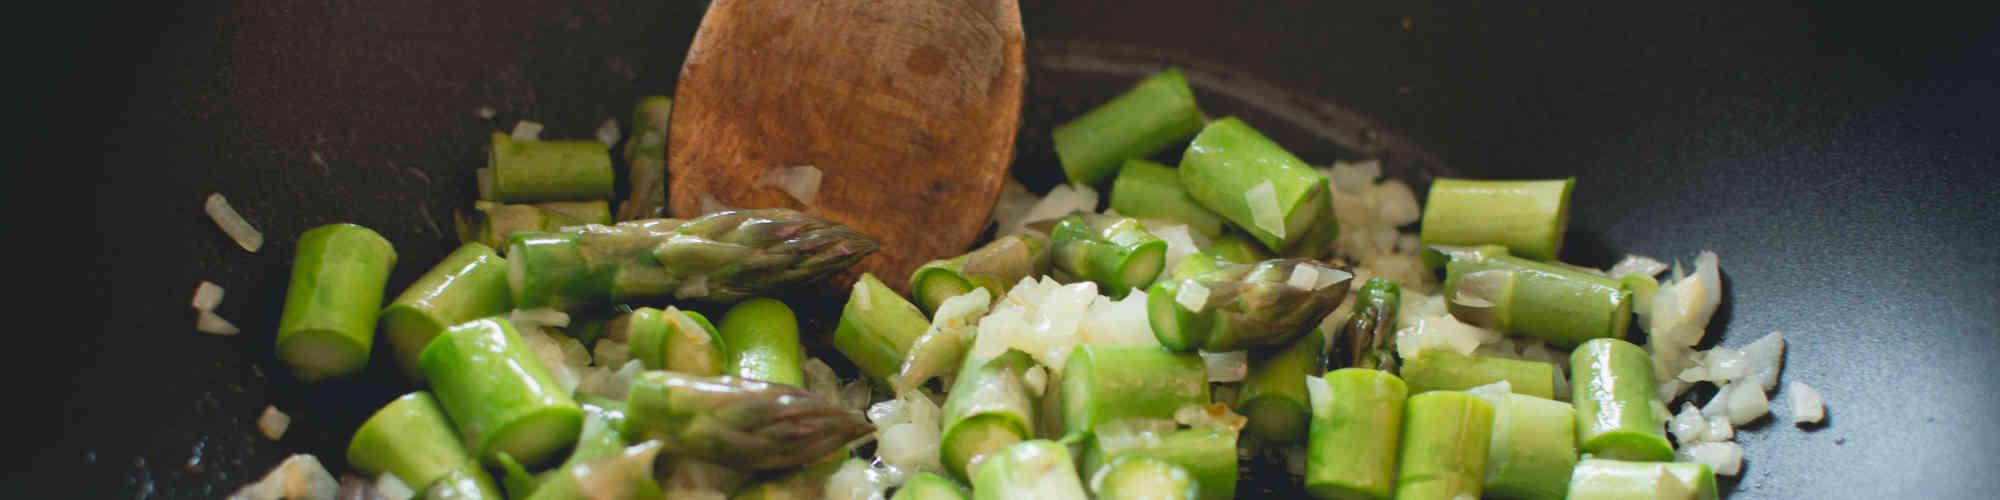 https://s3.amazonaws.com/ka-images-prod/mastheads/asparagus-onion-pan.jpg